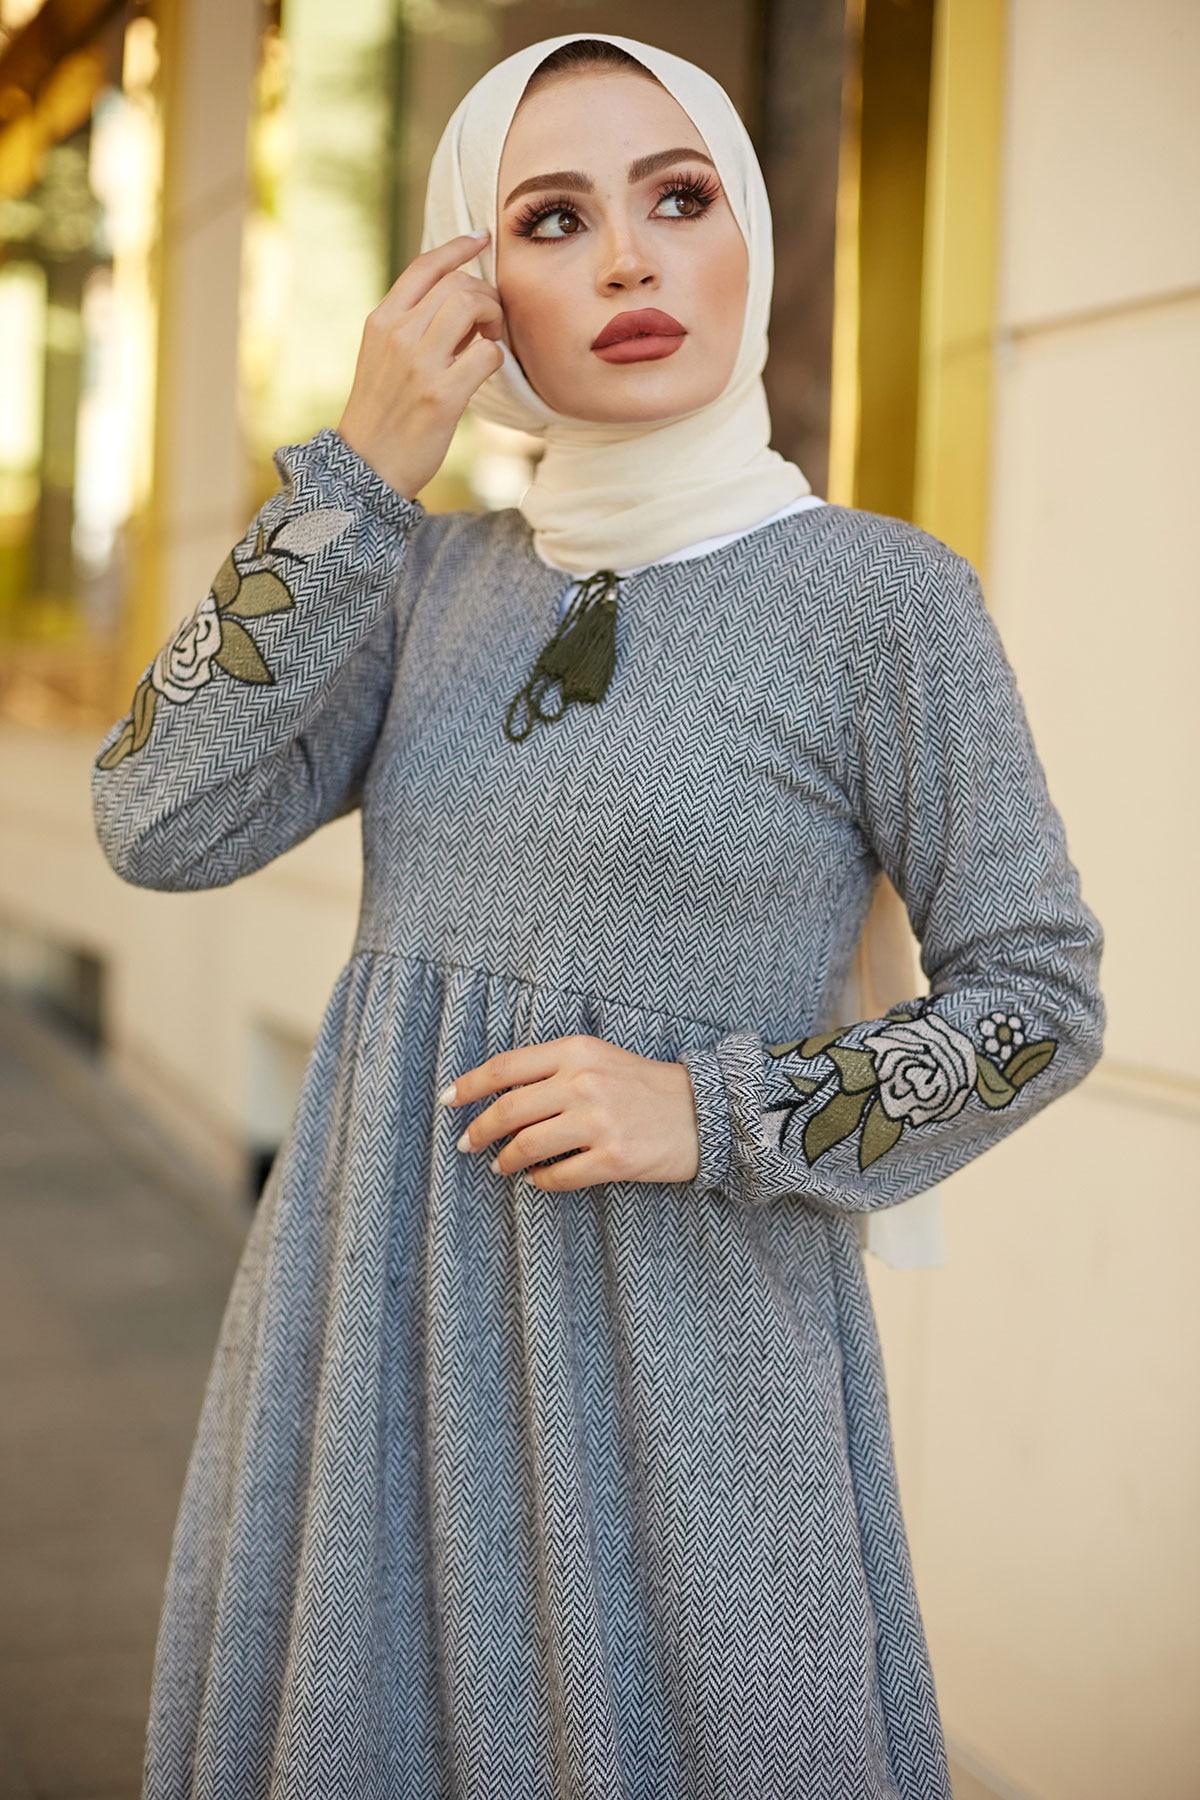 فستان طويل نسائي شتوي عباية امرأة ستر خريف عربي ماروس فساتين تركية دبي فساتين موضة شحن سريع